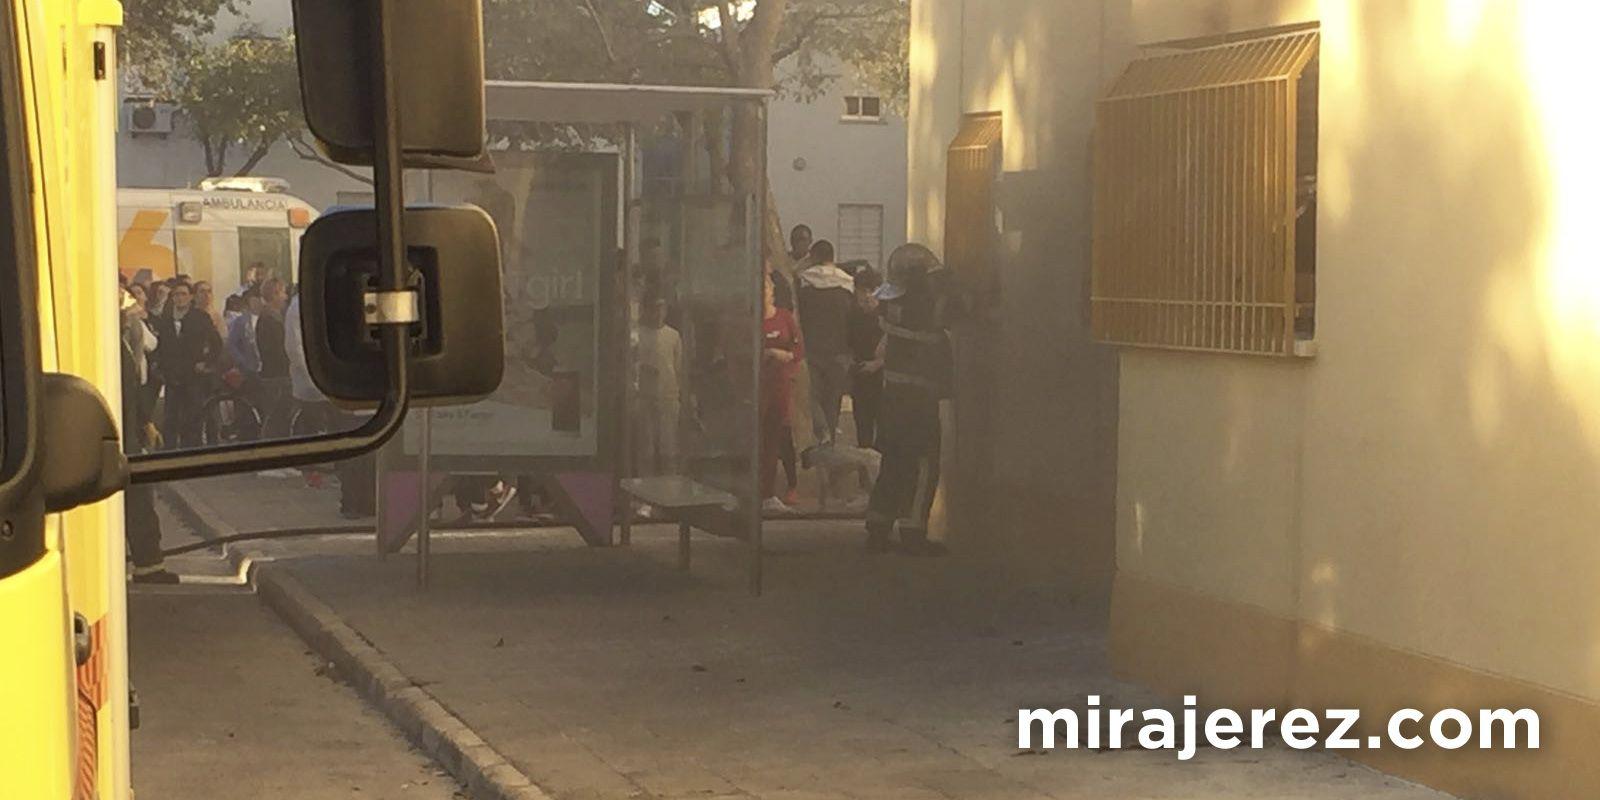 Incendio en Bloque 16, barriada de Vallesequillo | Foto de Ricardo Franco para MIRA Jerez